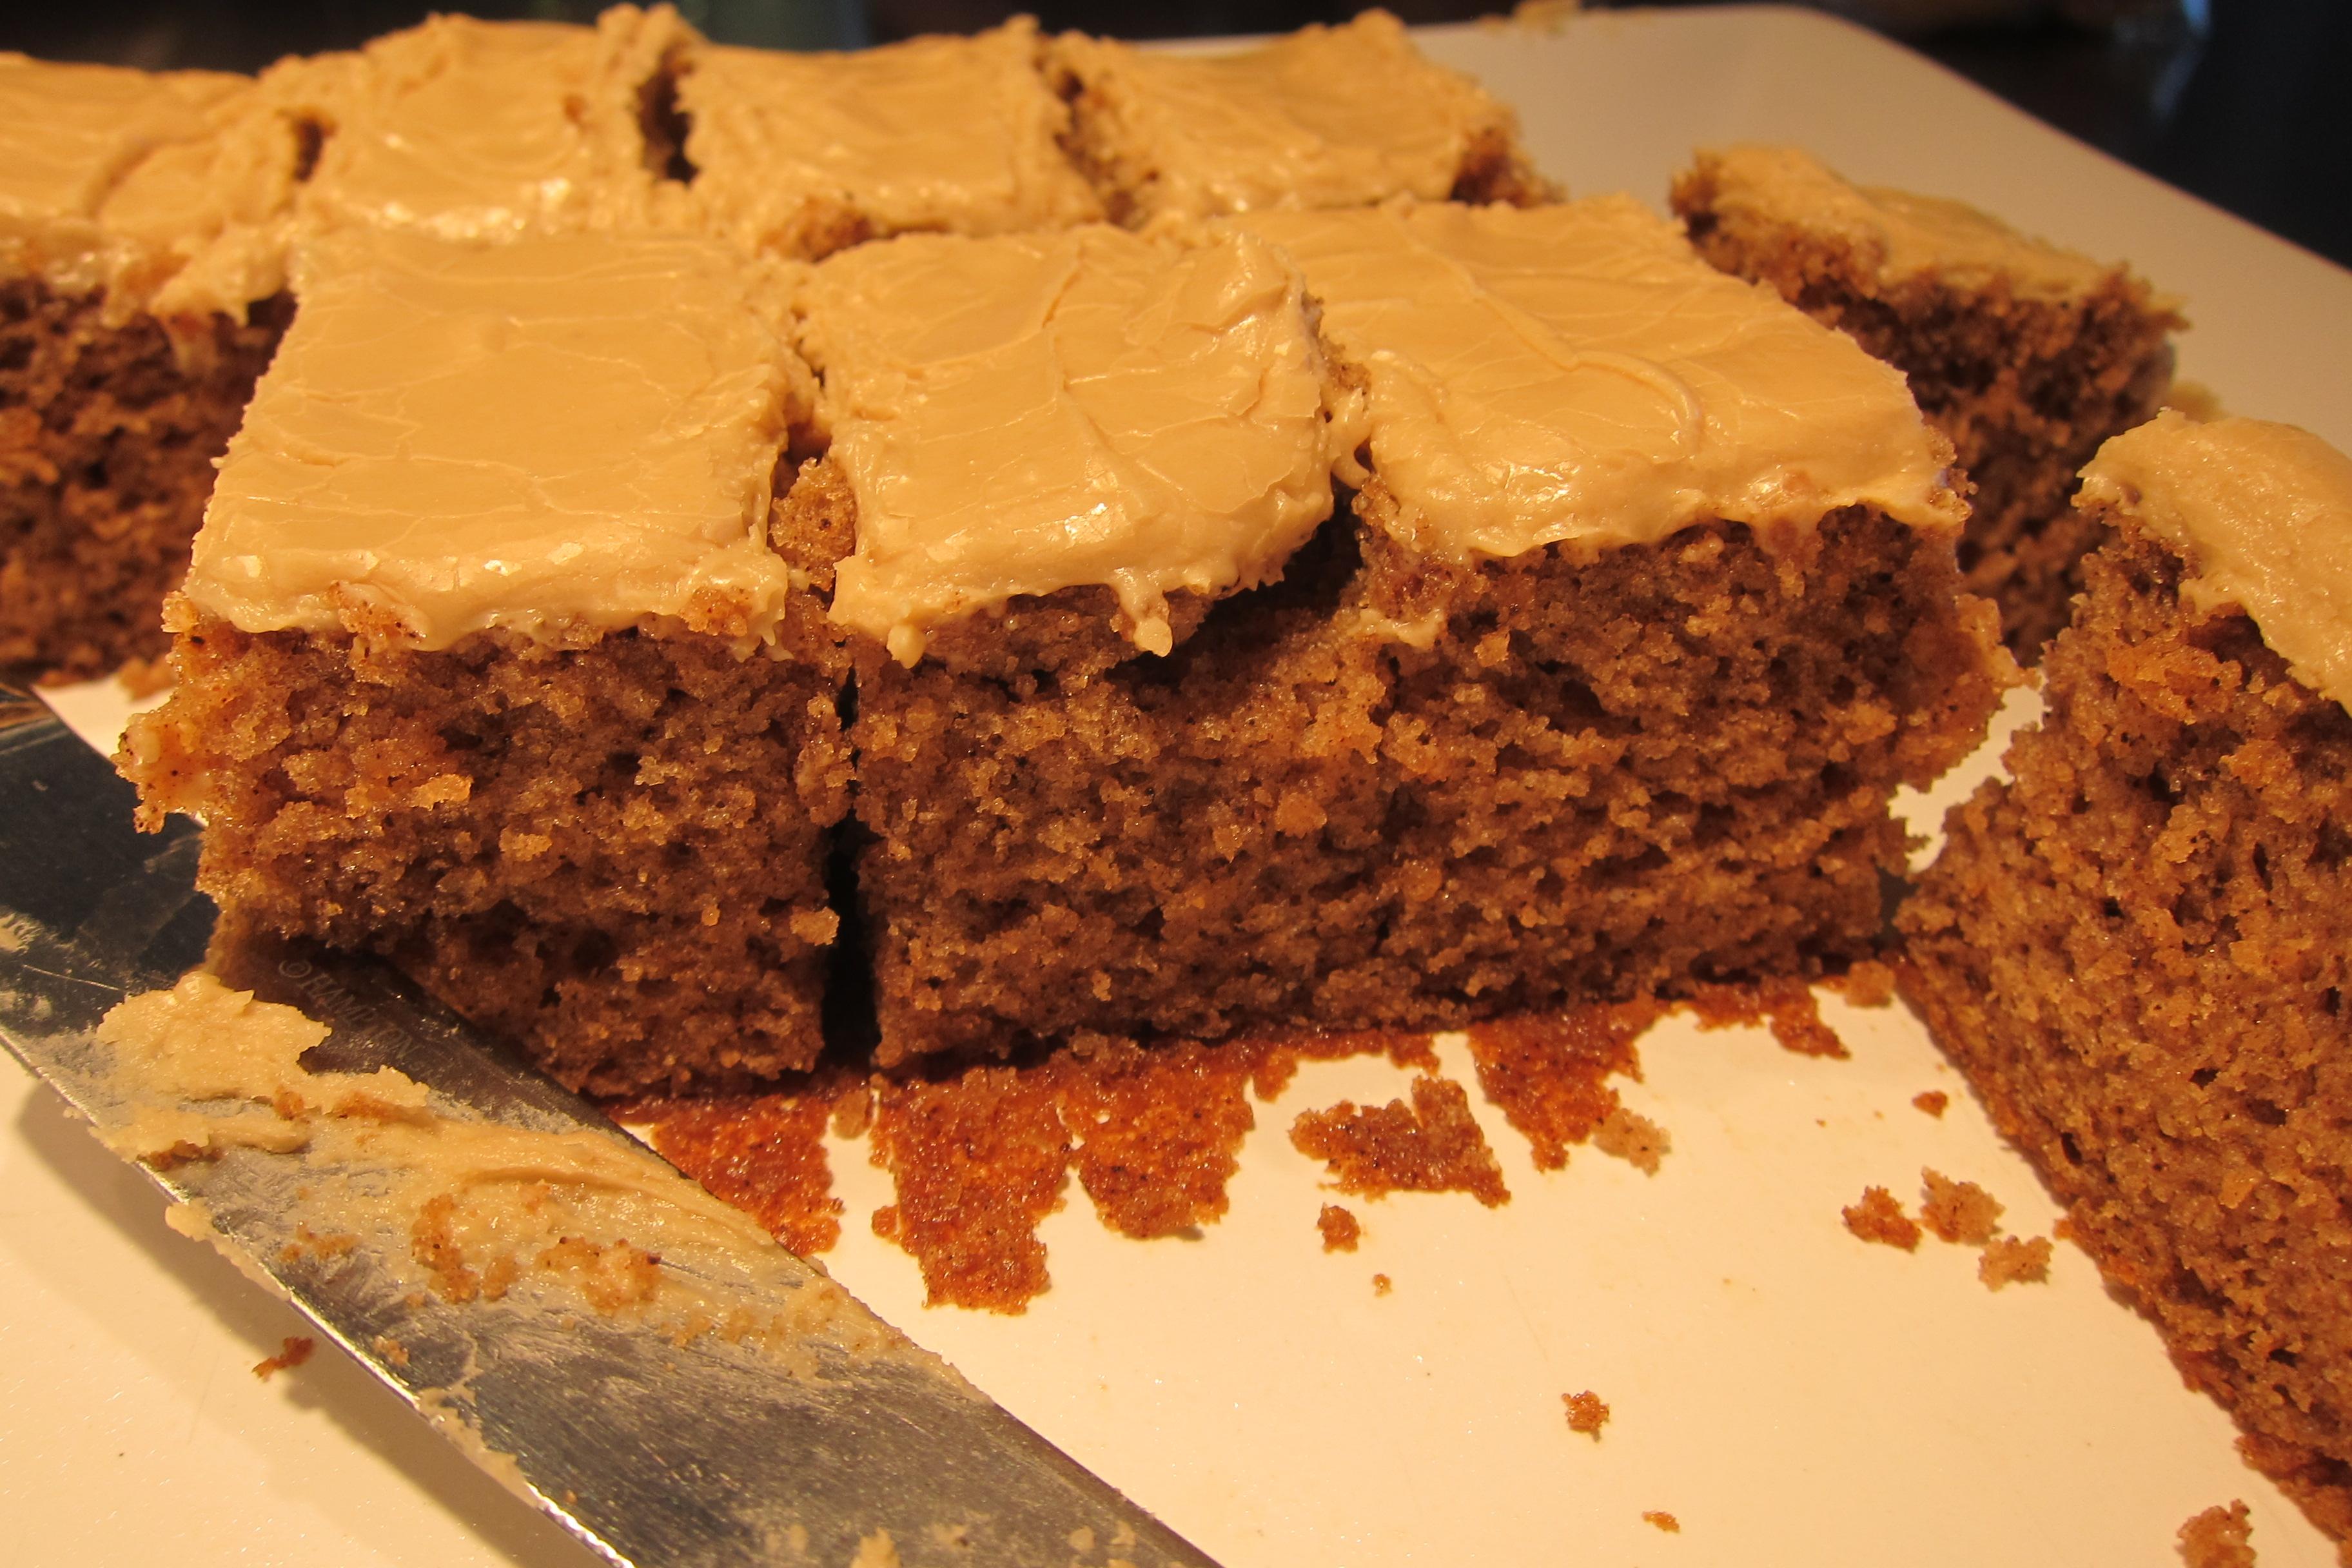 Gails_spice_cake_slices_LWWA